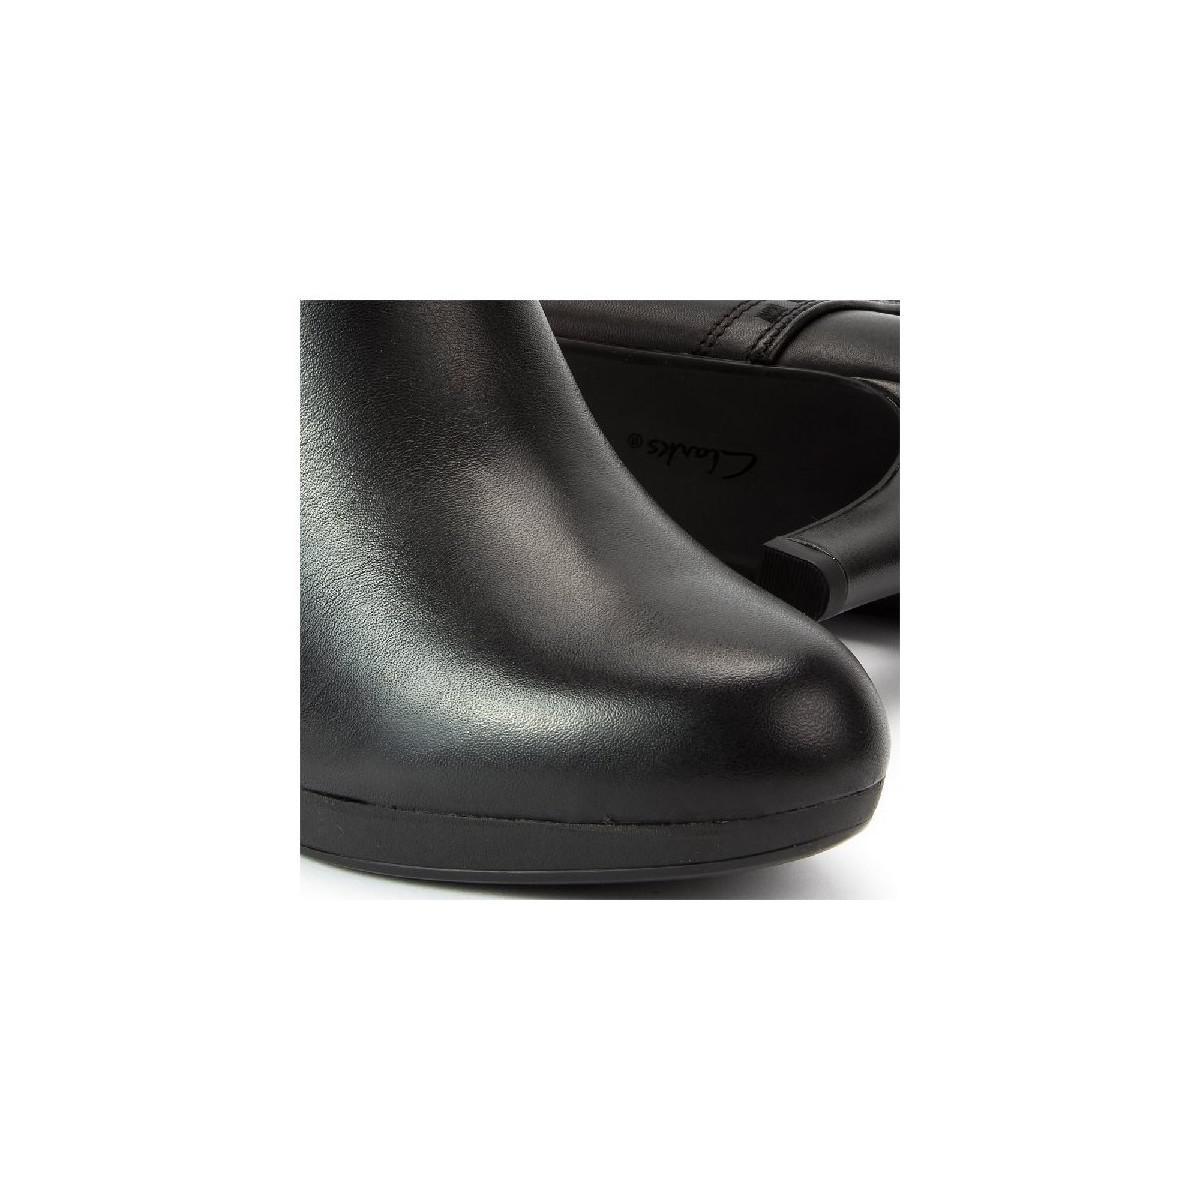 ee13add35d Clarks Adriel Sadie Women's Low Ankle Boots In Multicolour in Black ...